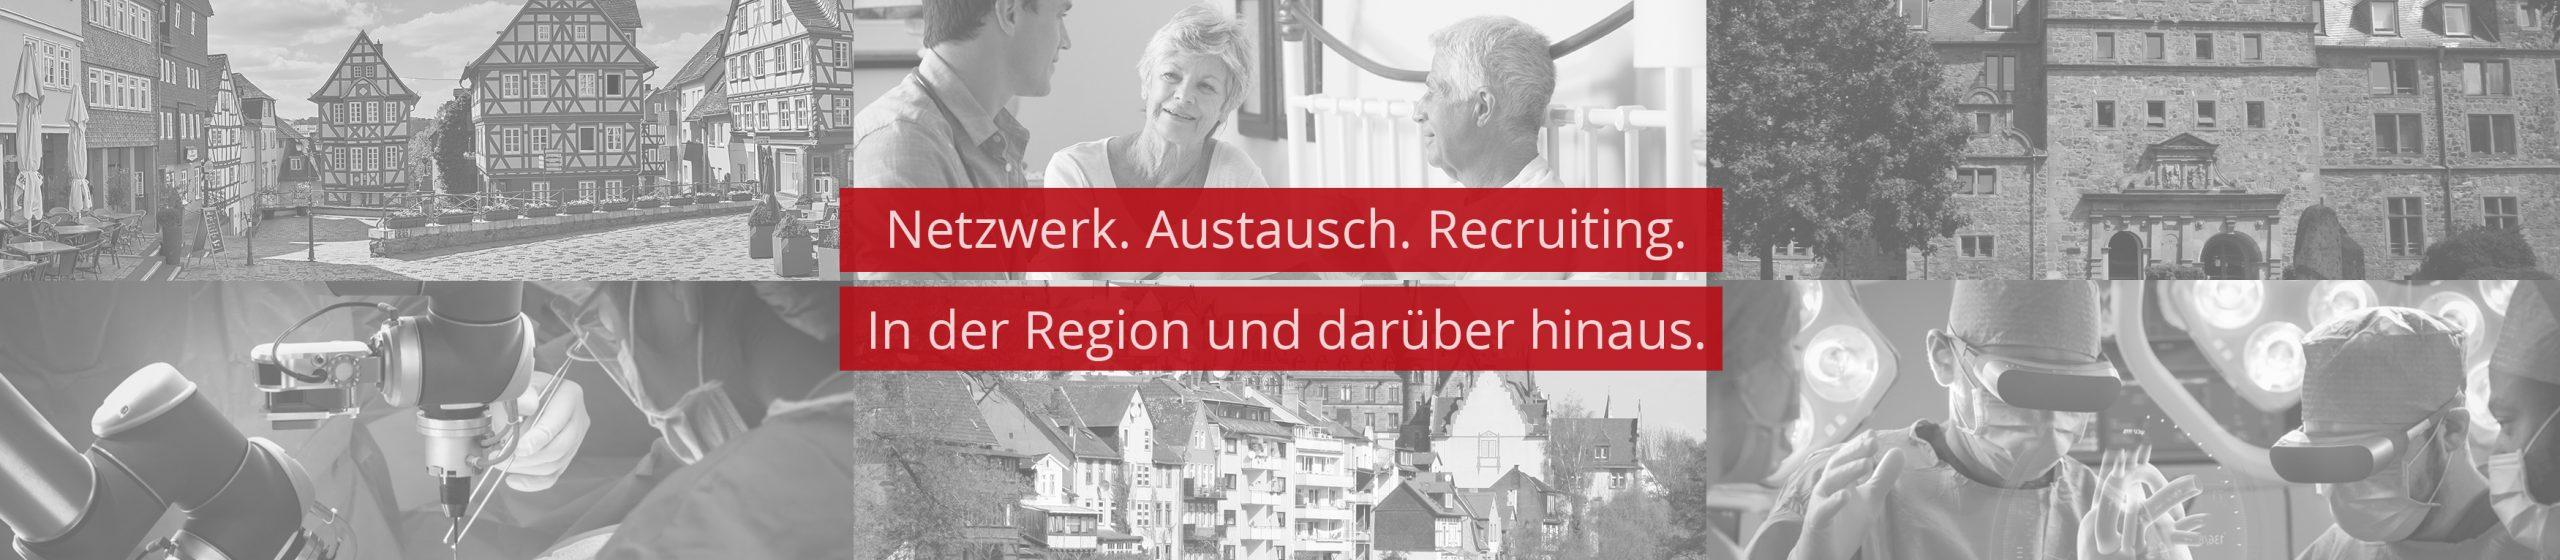 Healthcare_mittelhessen_netzwerk_austausch_recruitung_w